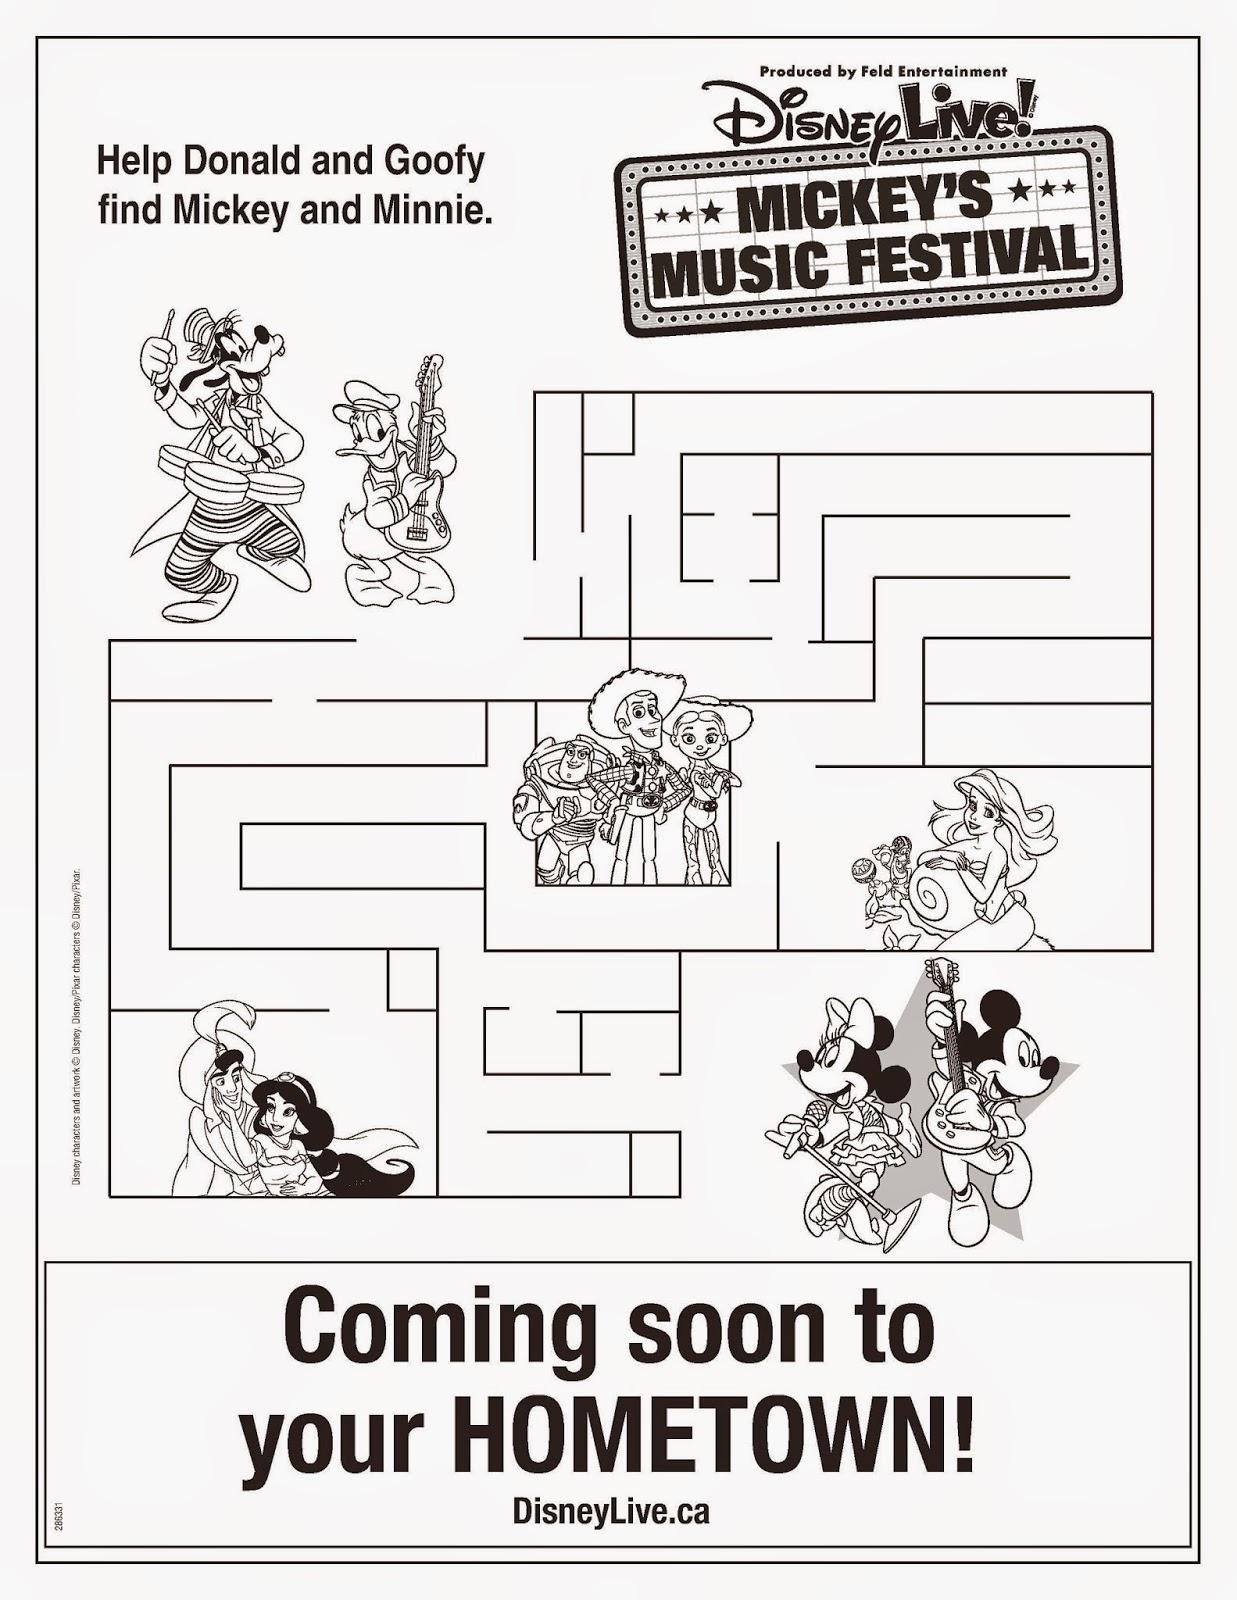 Tales of Mommyhood: Disney Live! Mickey's Music Festival